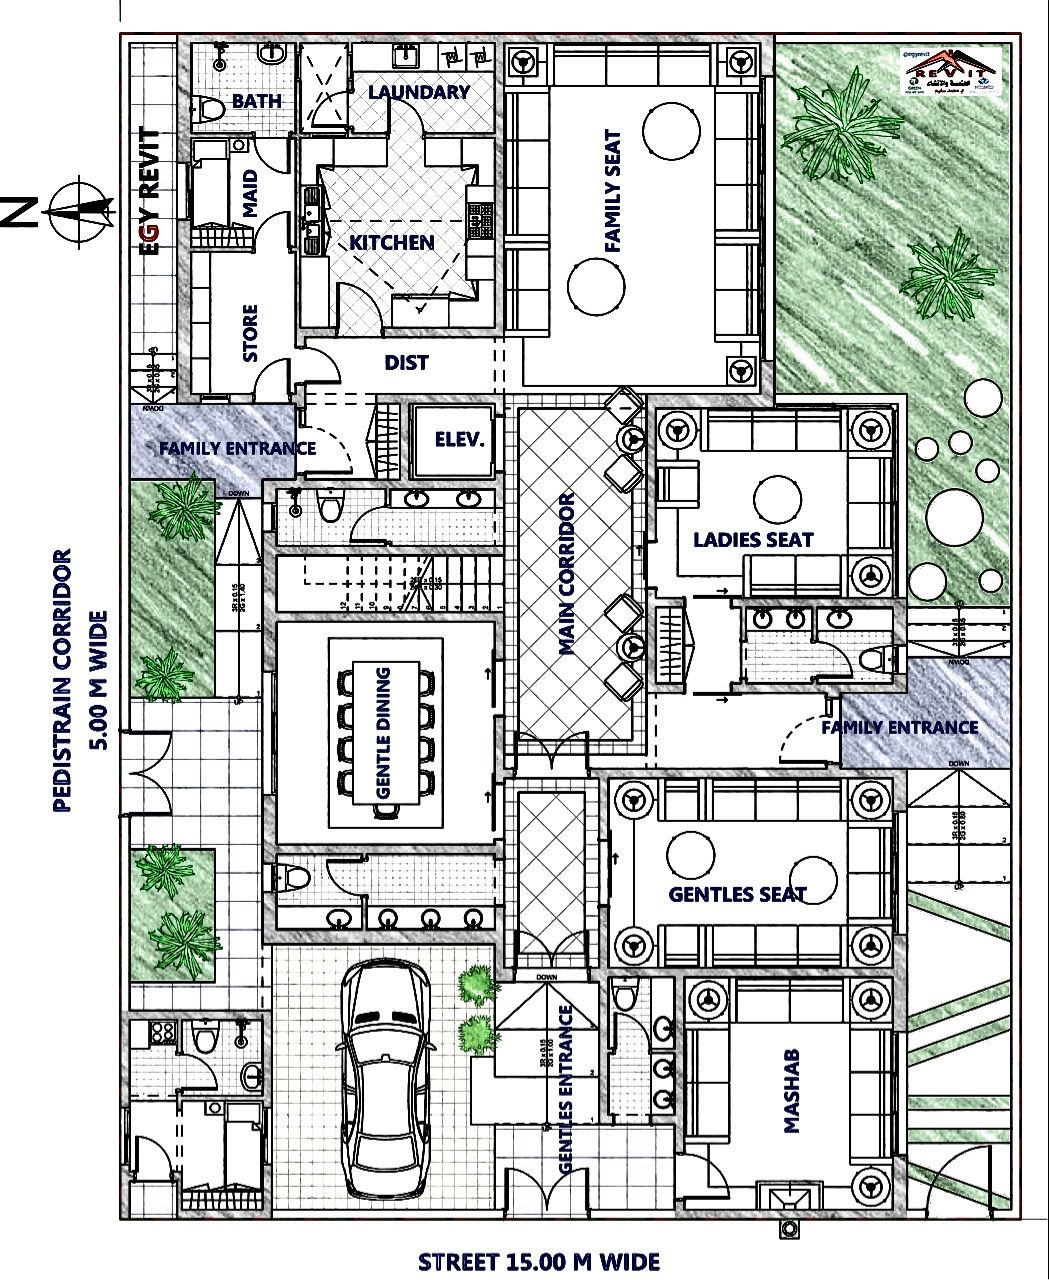 من تصميم ايجي ريفيت فيلا سكنية نيو كلاسيك مسقط أفقي للدور الارضي New House Plans Floor Plans House Plans